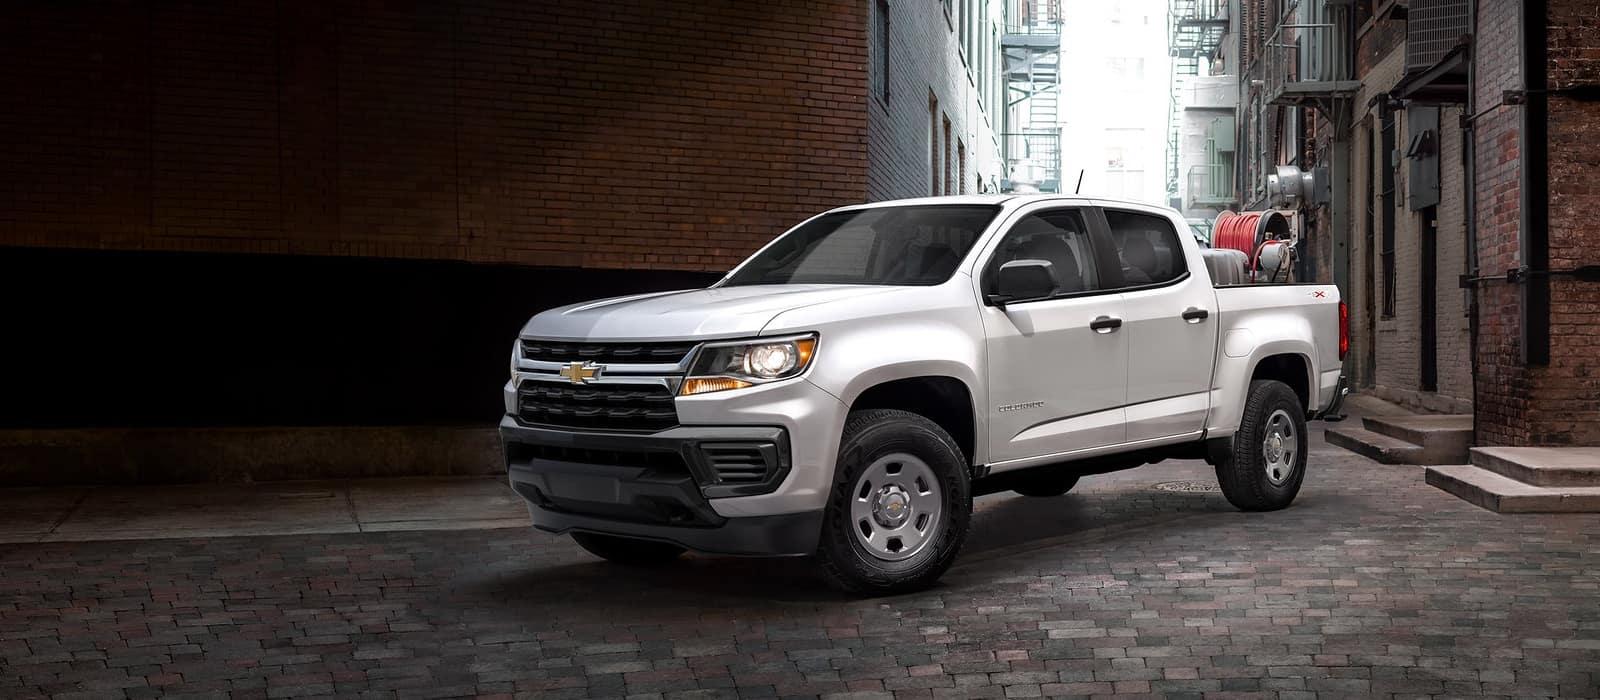 2021 Chevrolet Colorado Spotlight in Delaware, OH